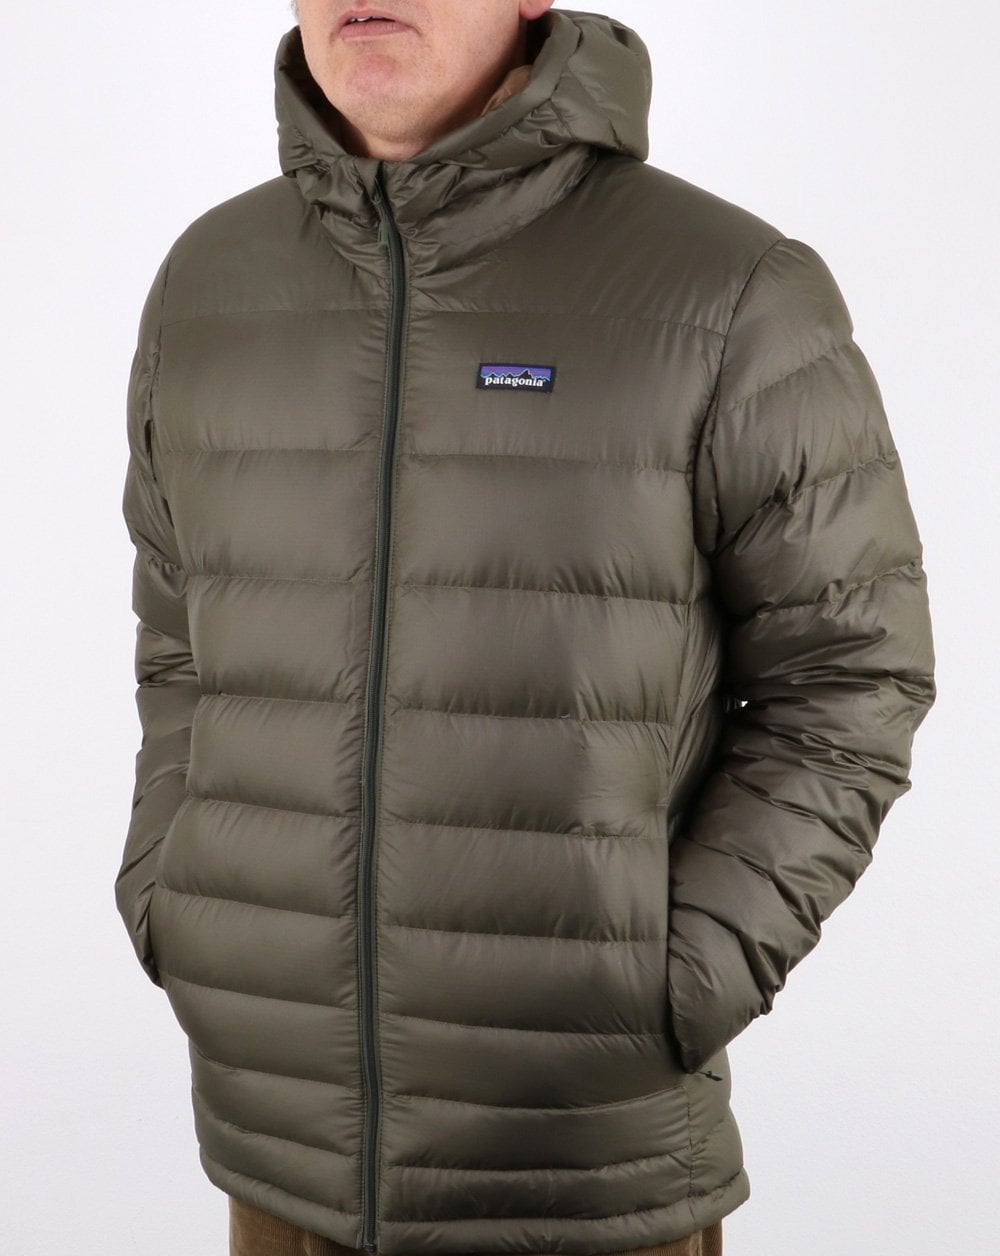 Patagonia Hi Loft Down Hooded Jacket Olive Green 80s